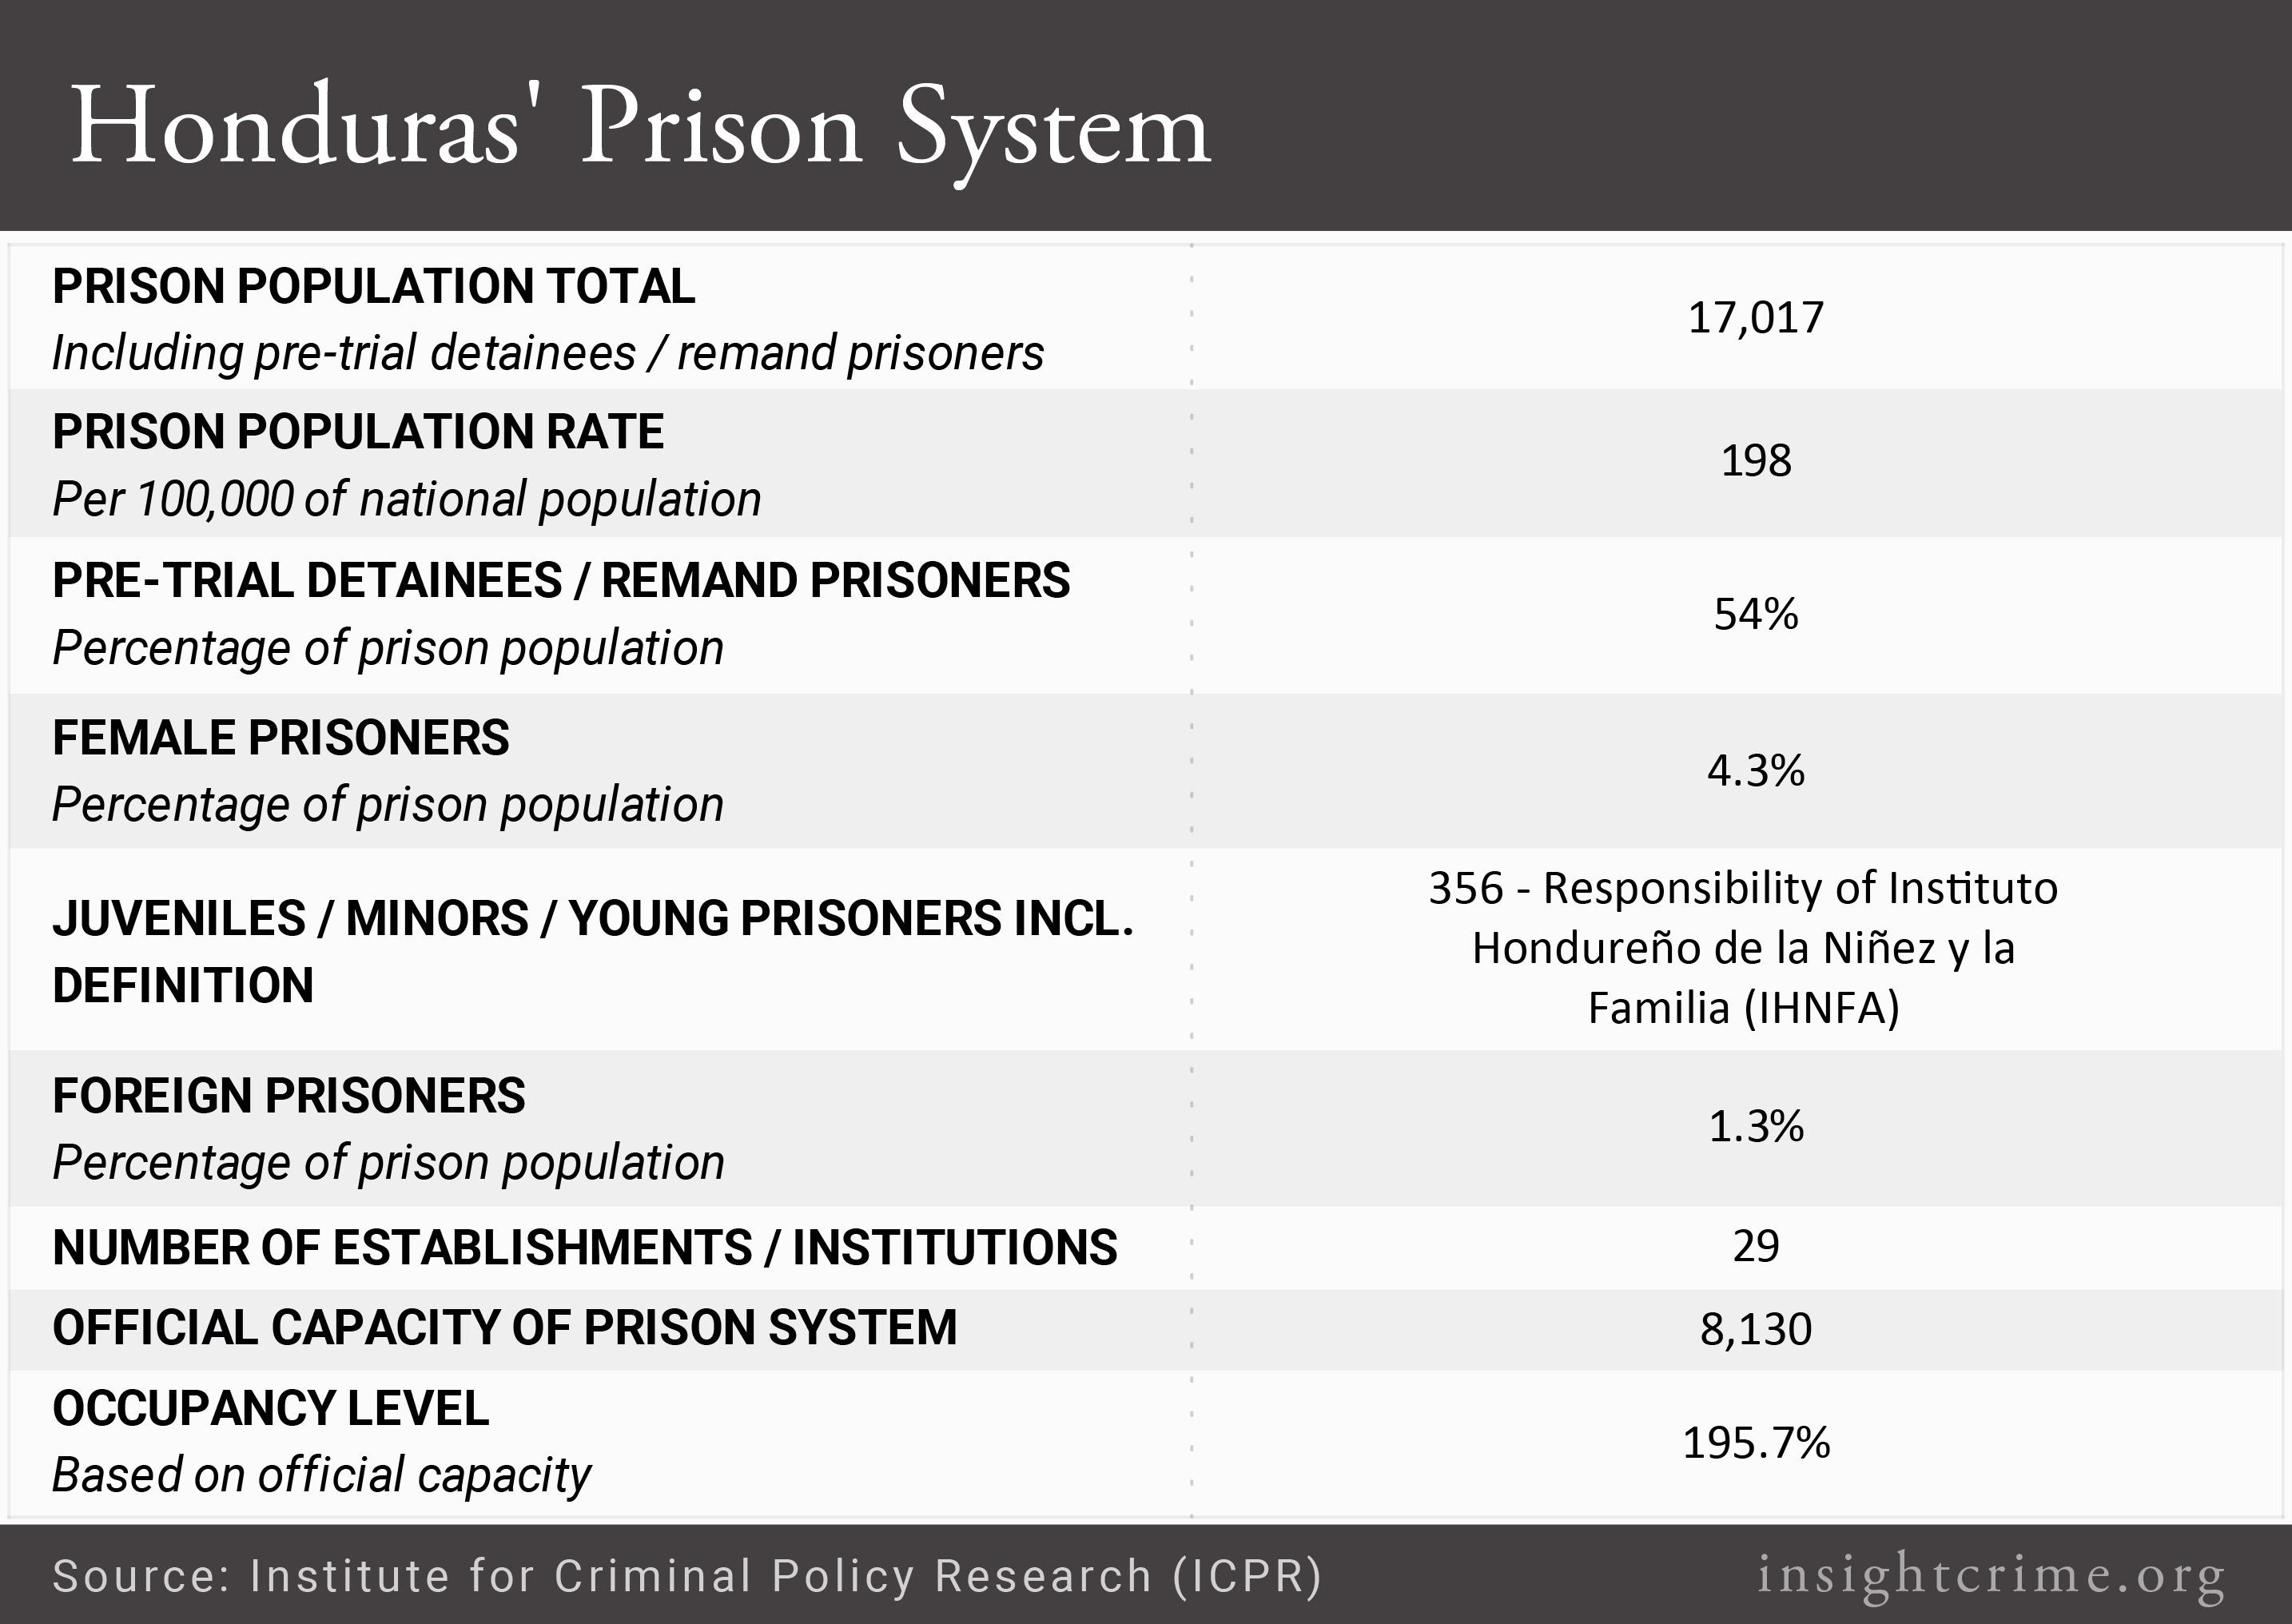 Honduras Prison System